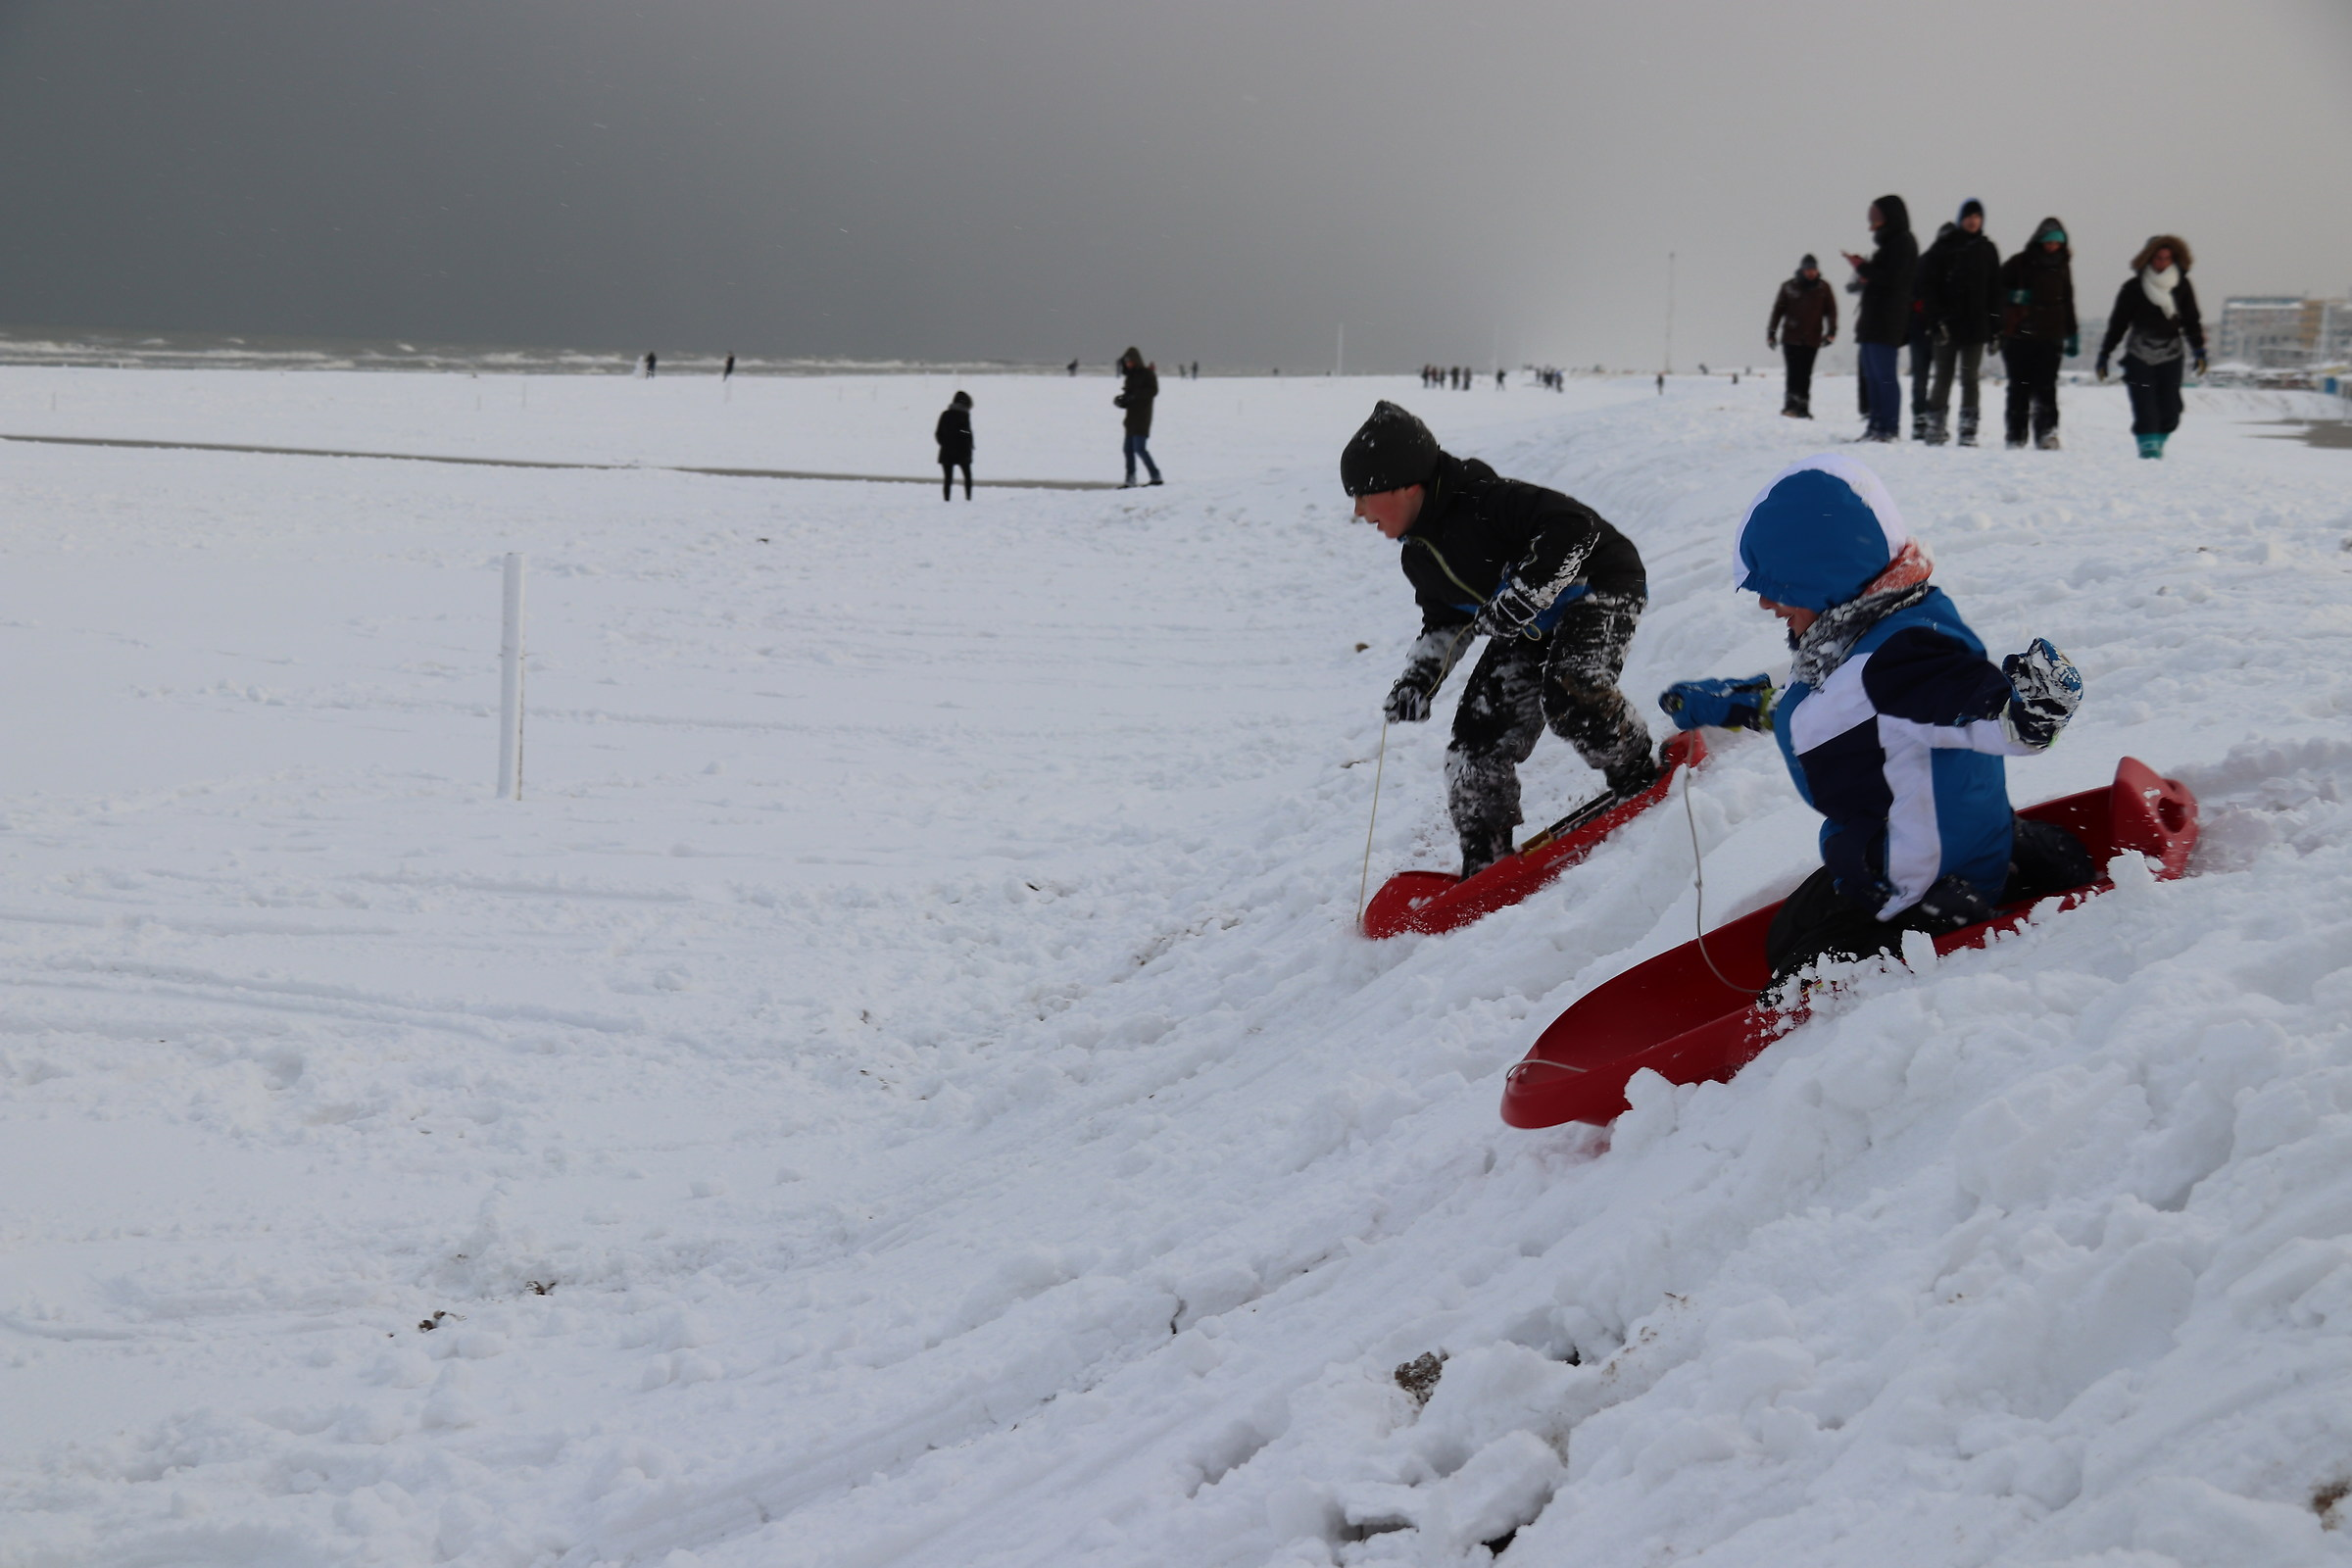 Snow in Spiagigia in Rimini...